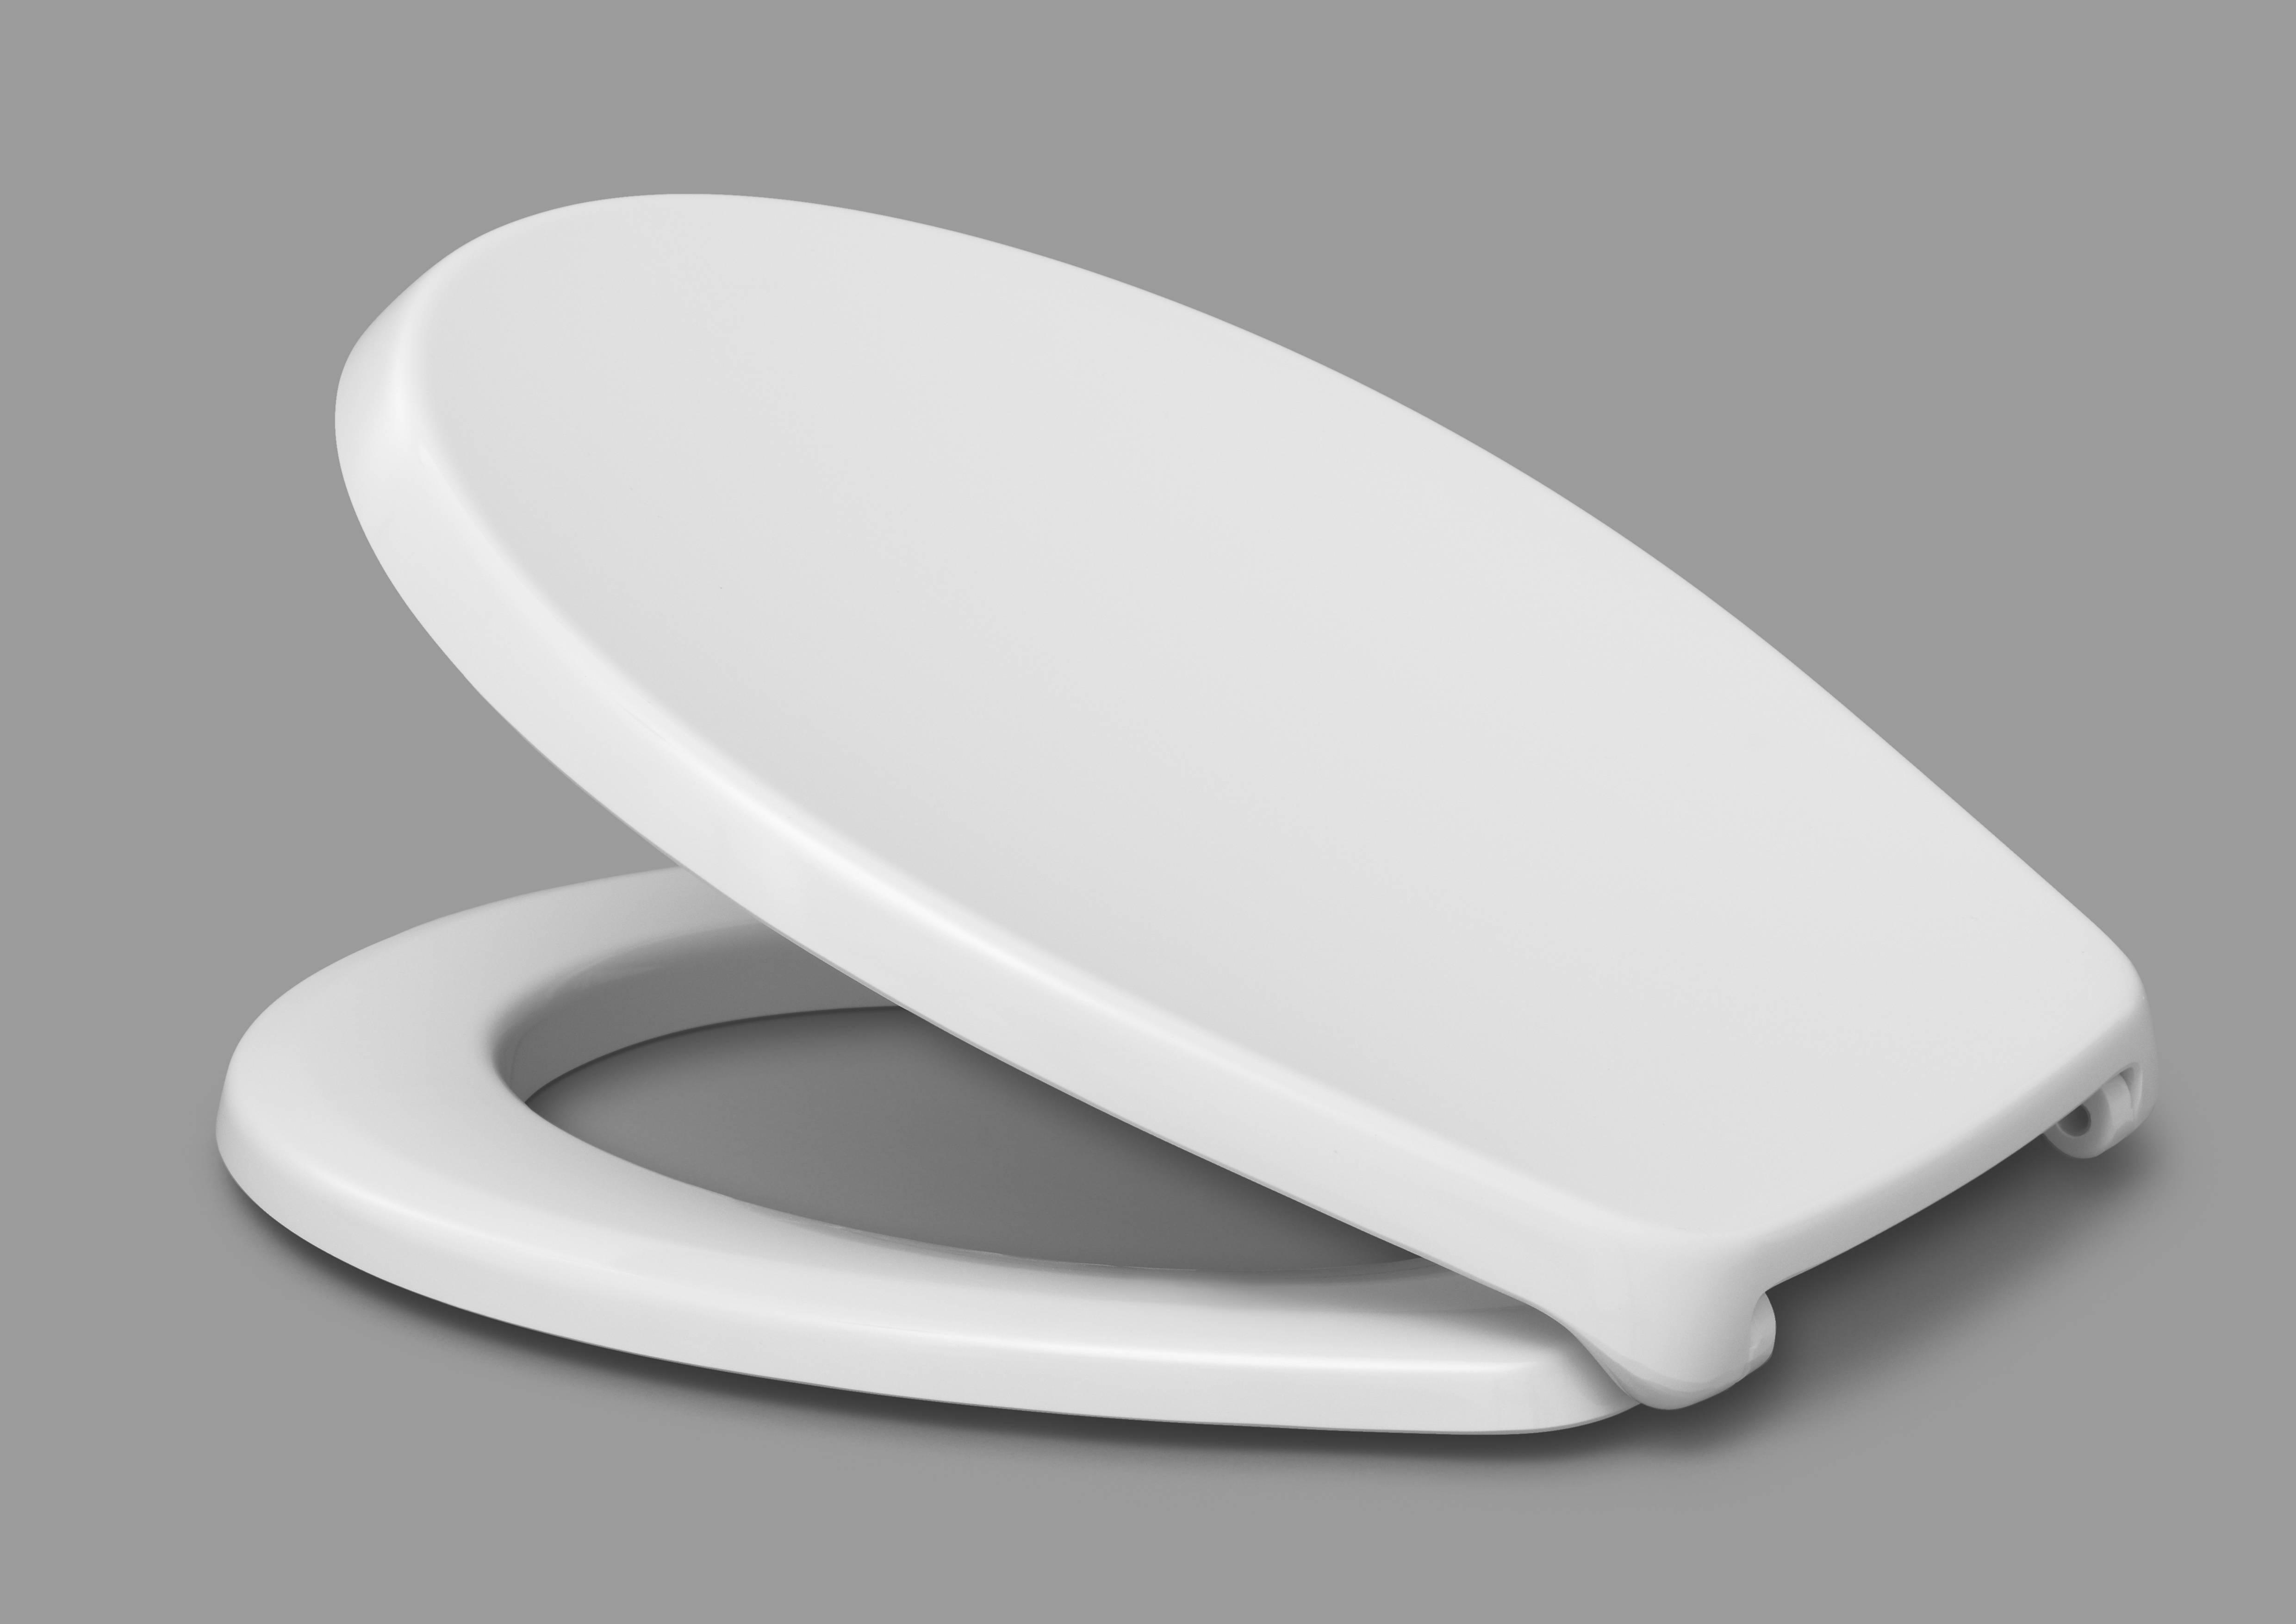 Capac WC HARO Duroplast PICO alb, sistem prindere inox FastFix